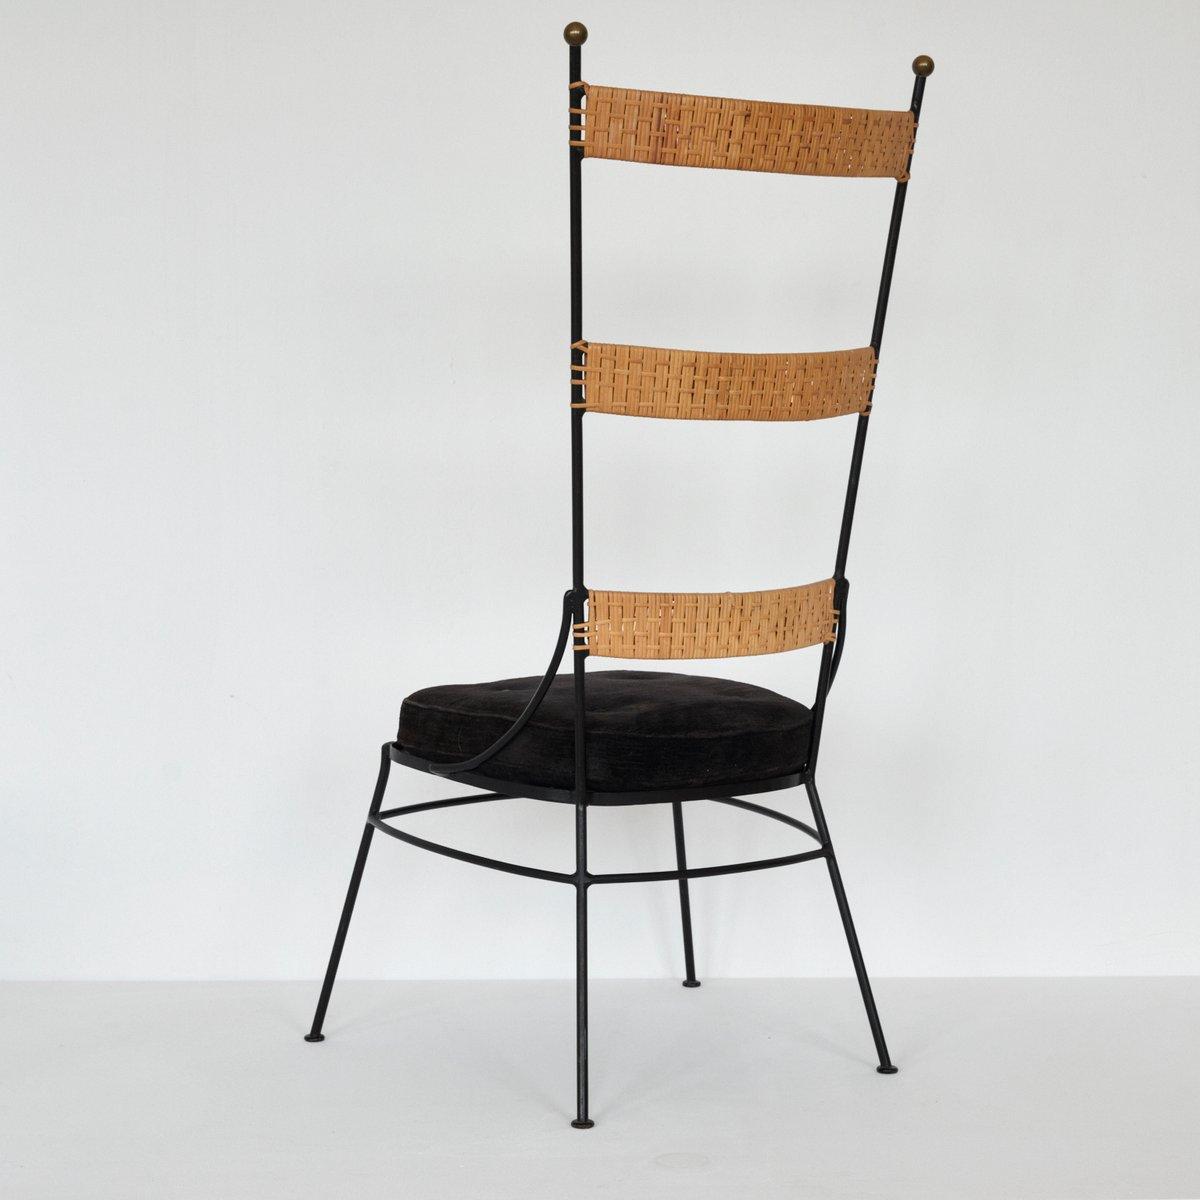 Stuhl aus metall rattan 1950er bei pamono kaufen for Design stuhl metall